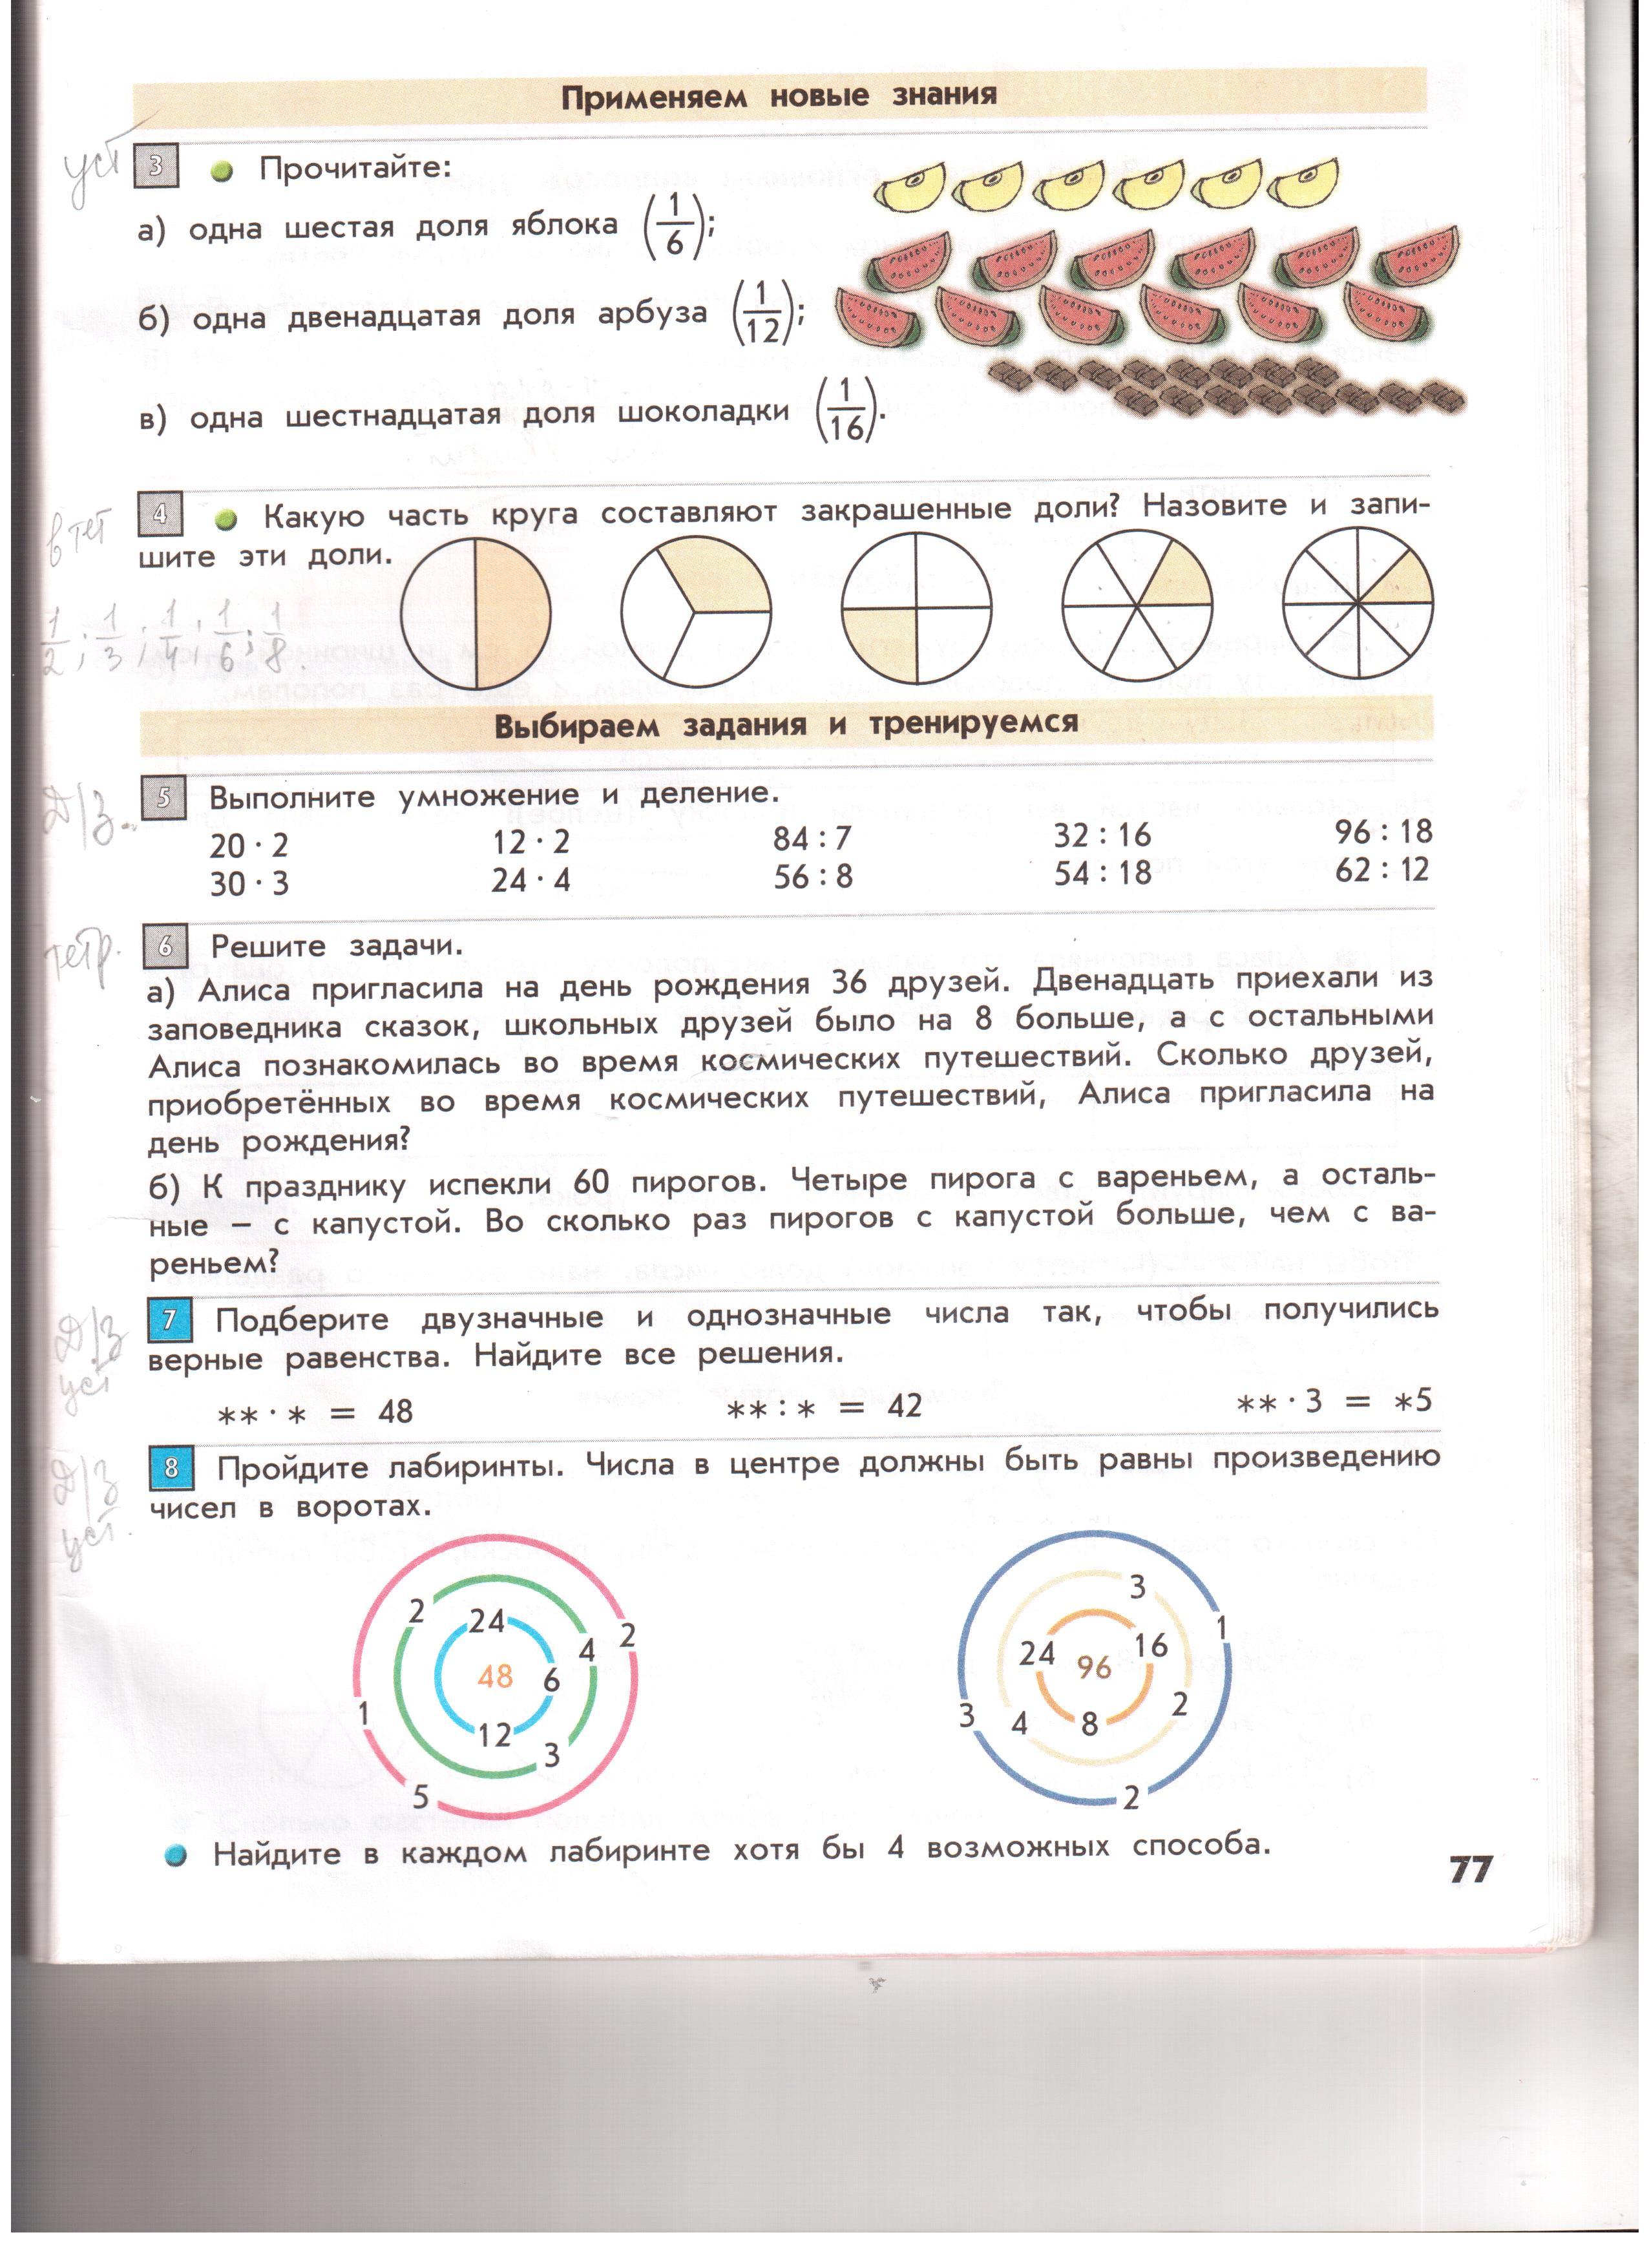 C:\Users\2класс\Documents\Scanned Documents\Рисунок (38).jpg